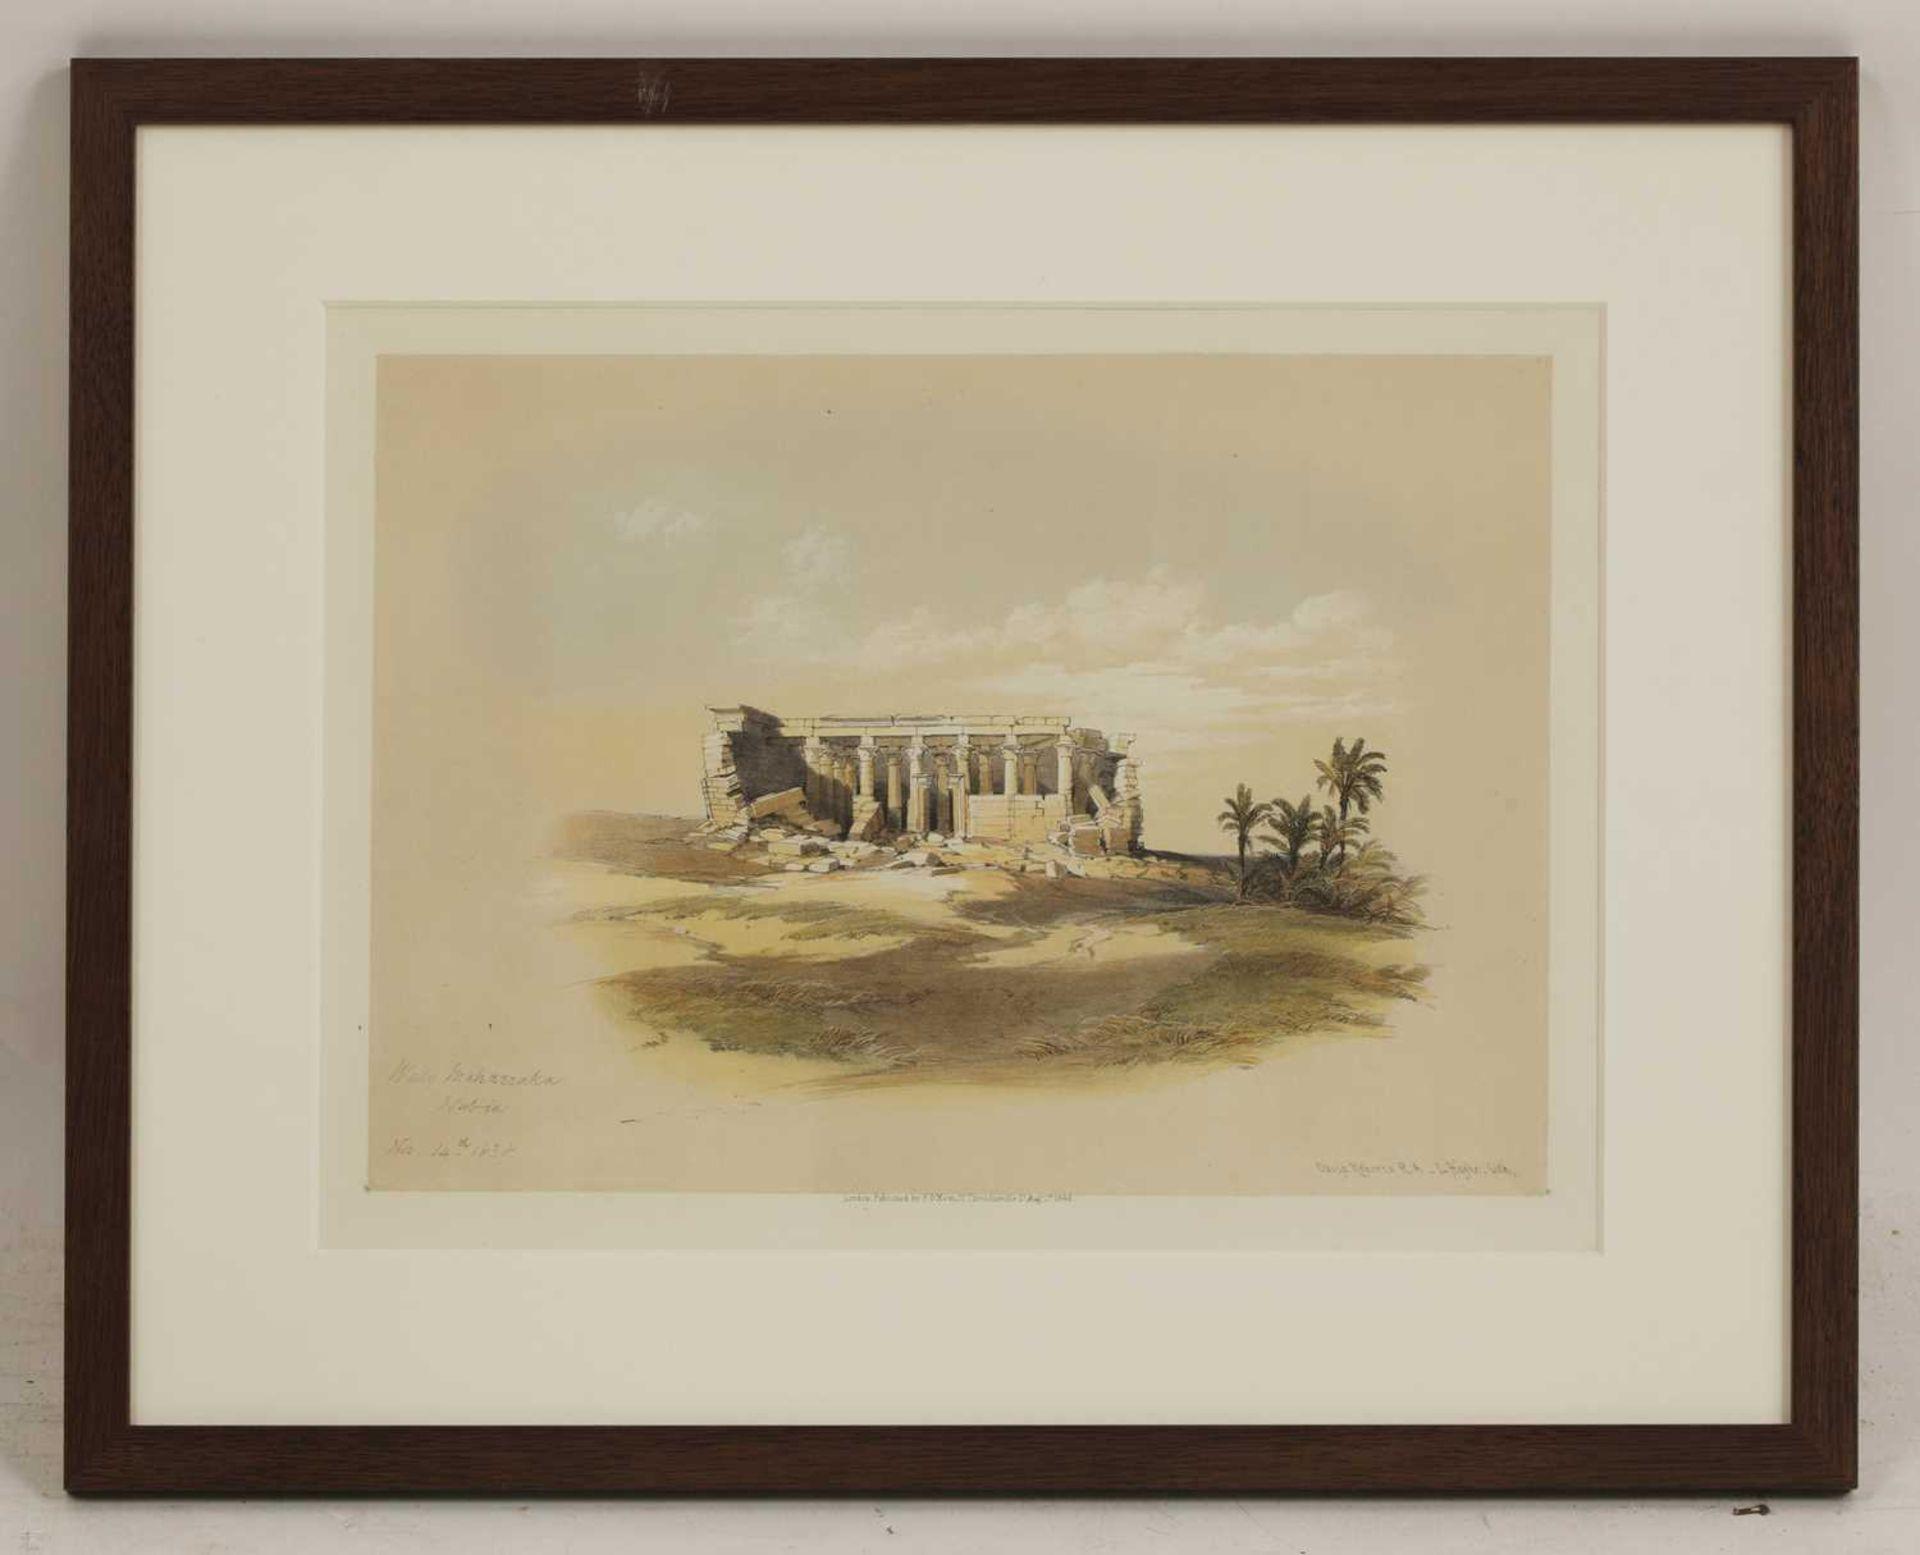 Louis Haghe after David Roberts RA (1796-1864) - Image 7 of 20